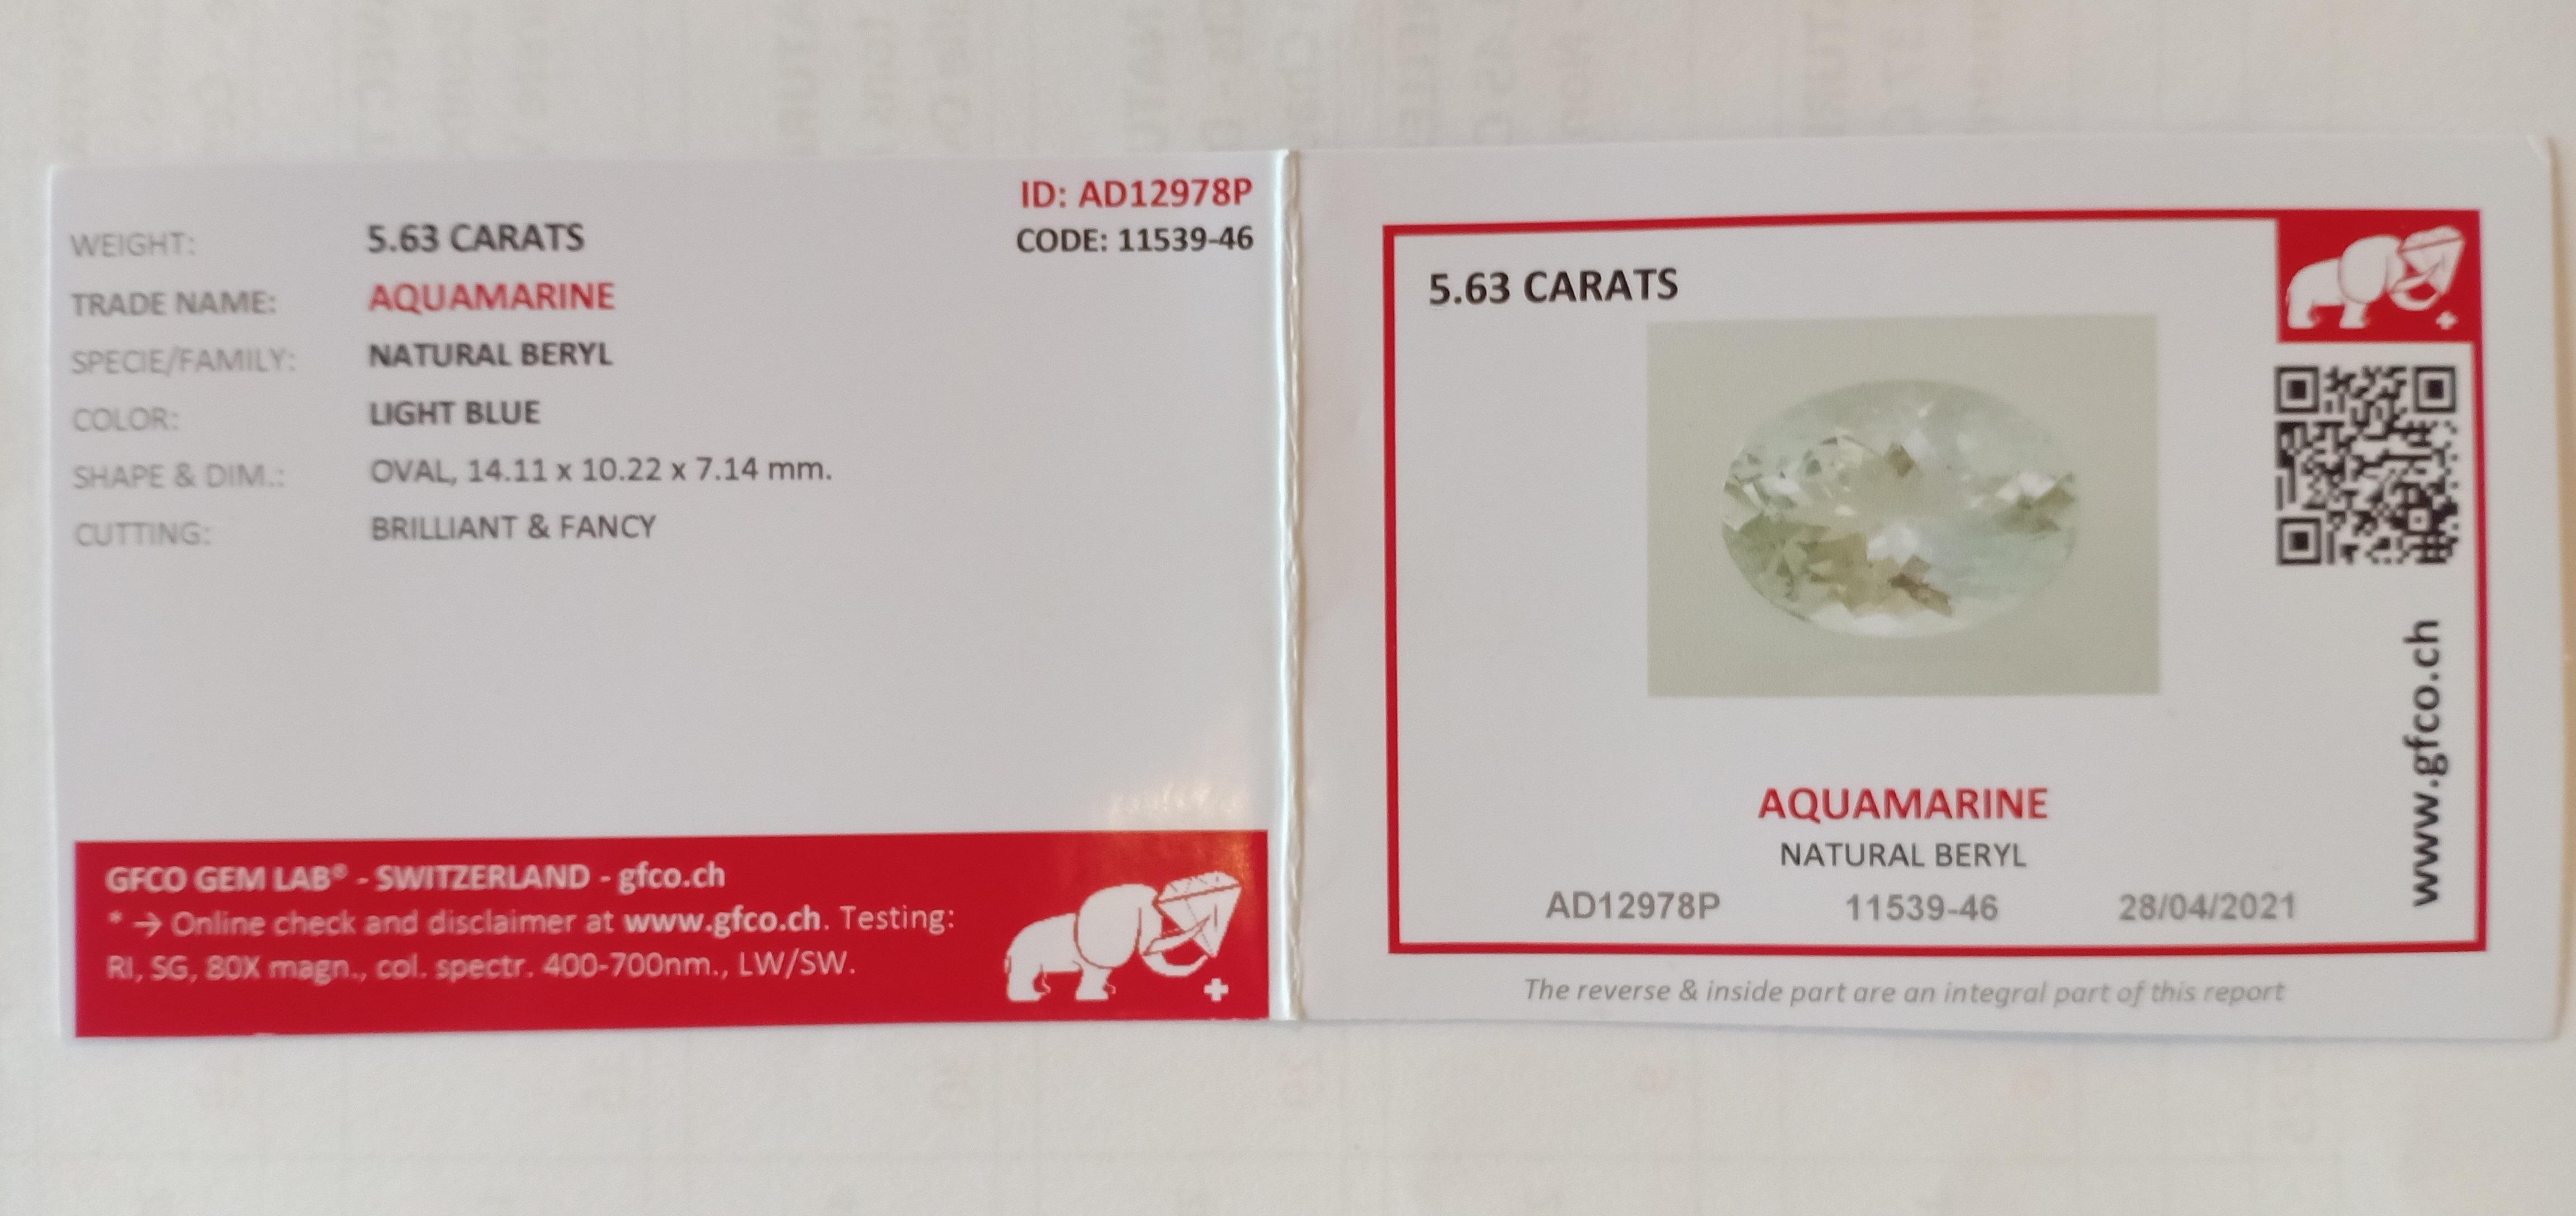 NATURAL AQUAMARINE - 5.63 Cts - BOLIVIA - Certificate GFCO Swiss Laboratory - Image 2 of 2